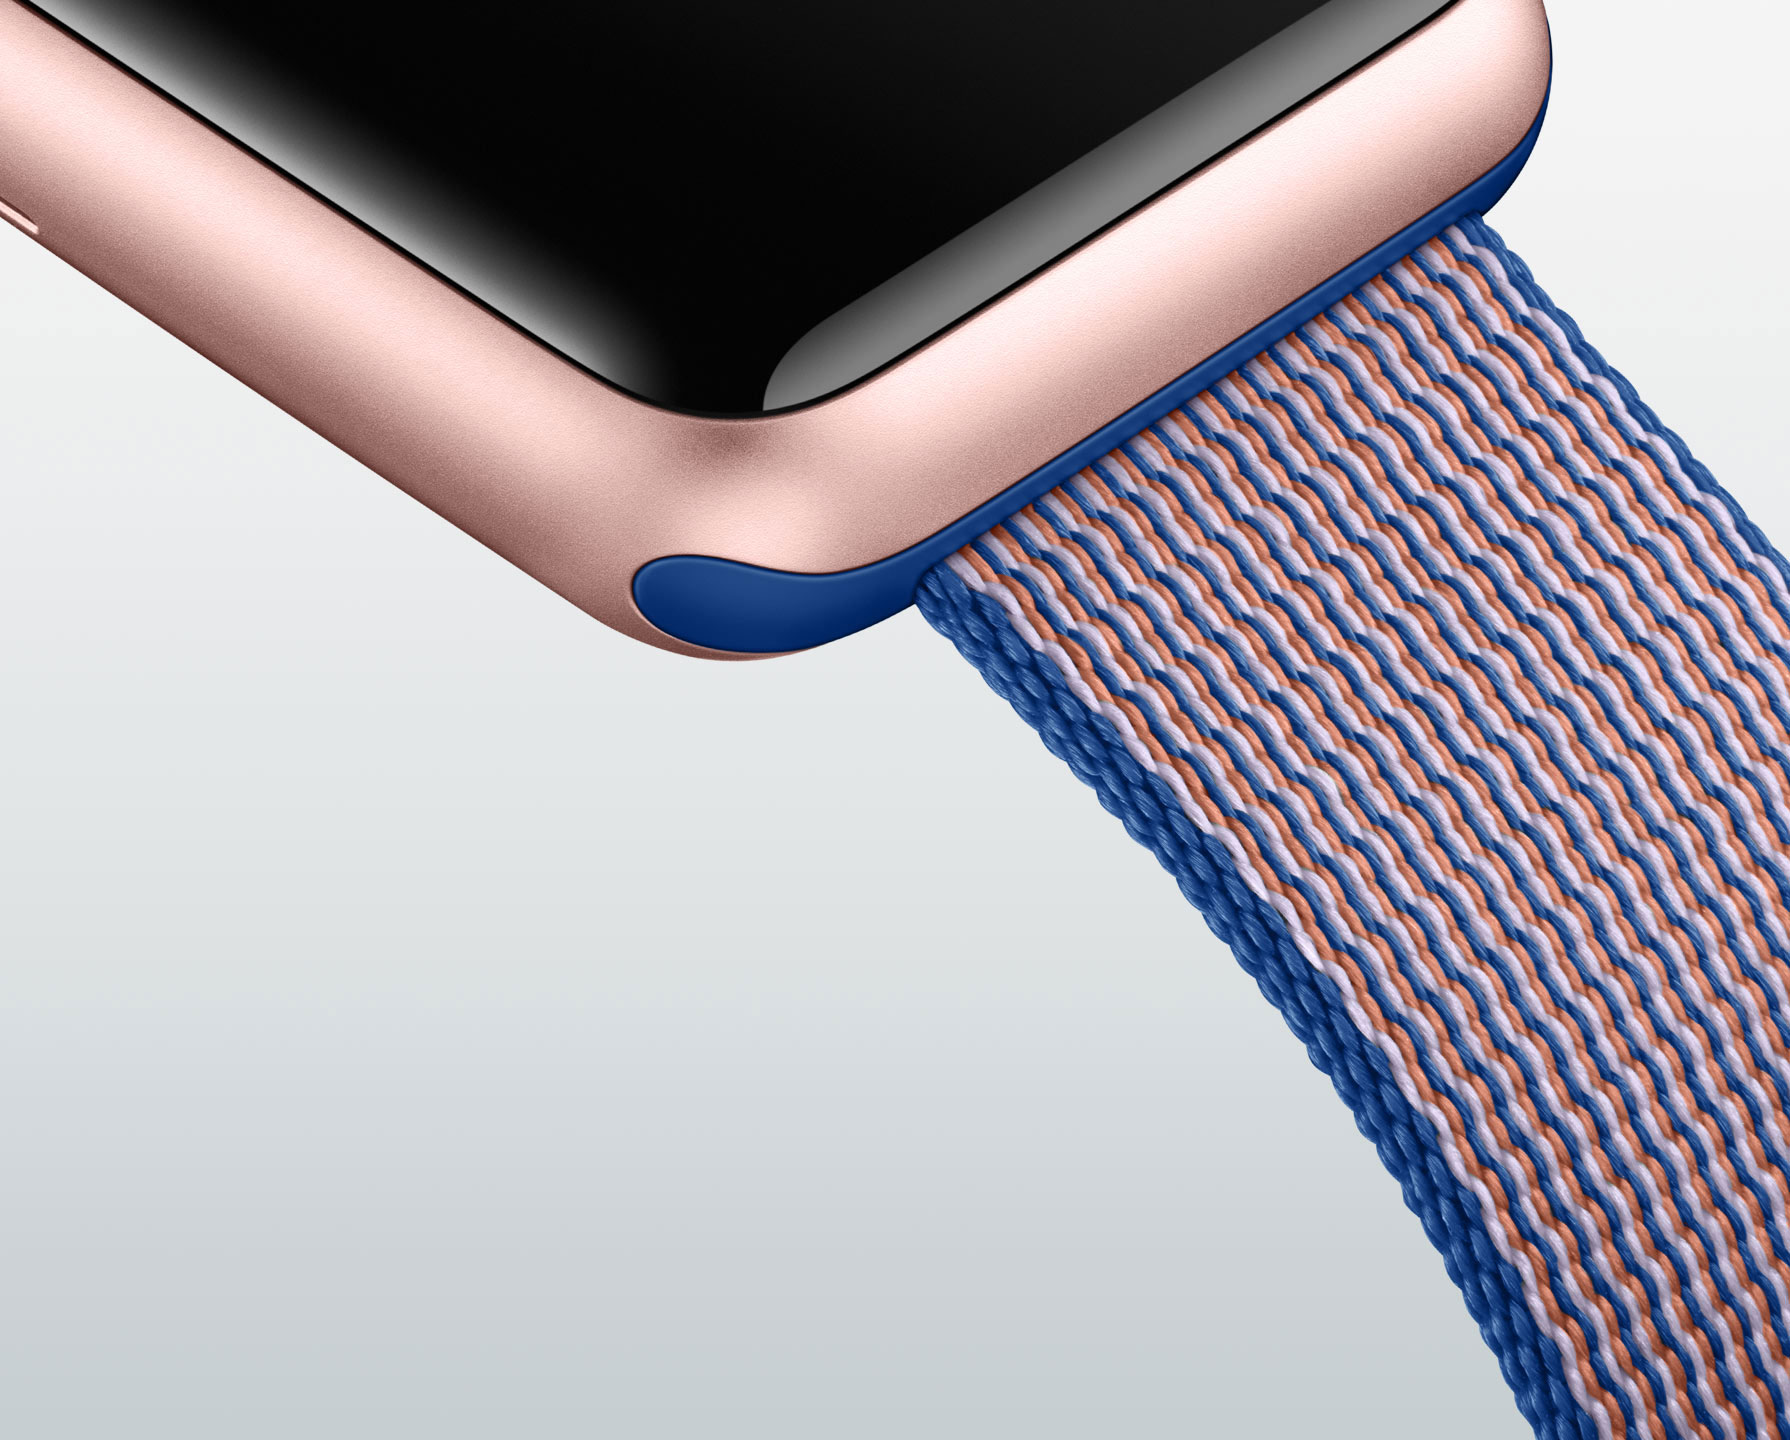 apple-watch-new-straps